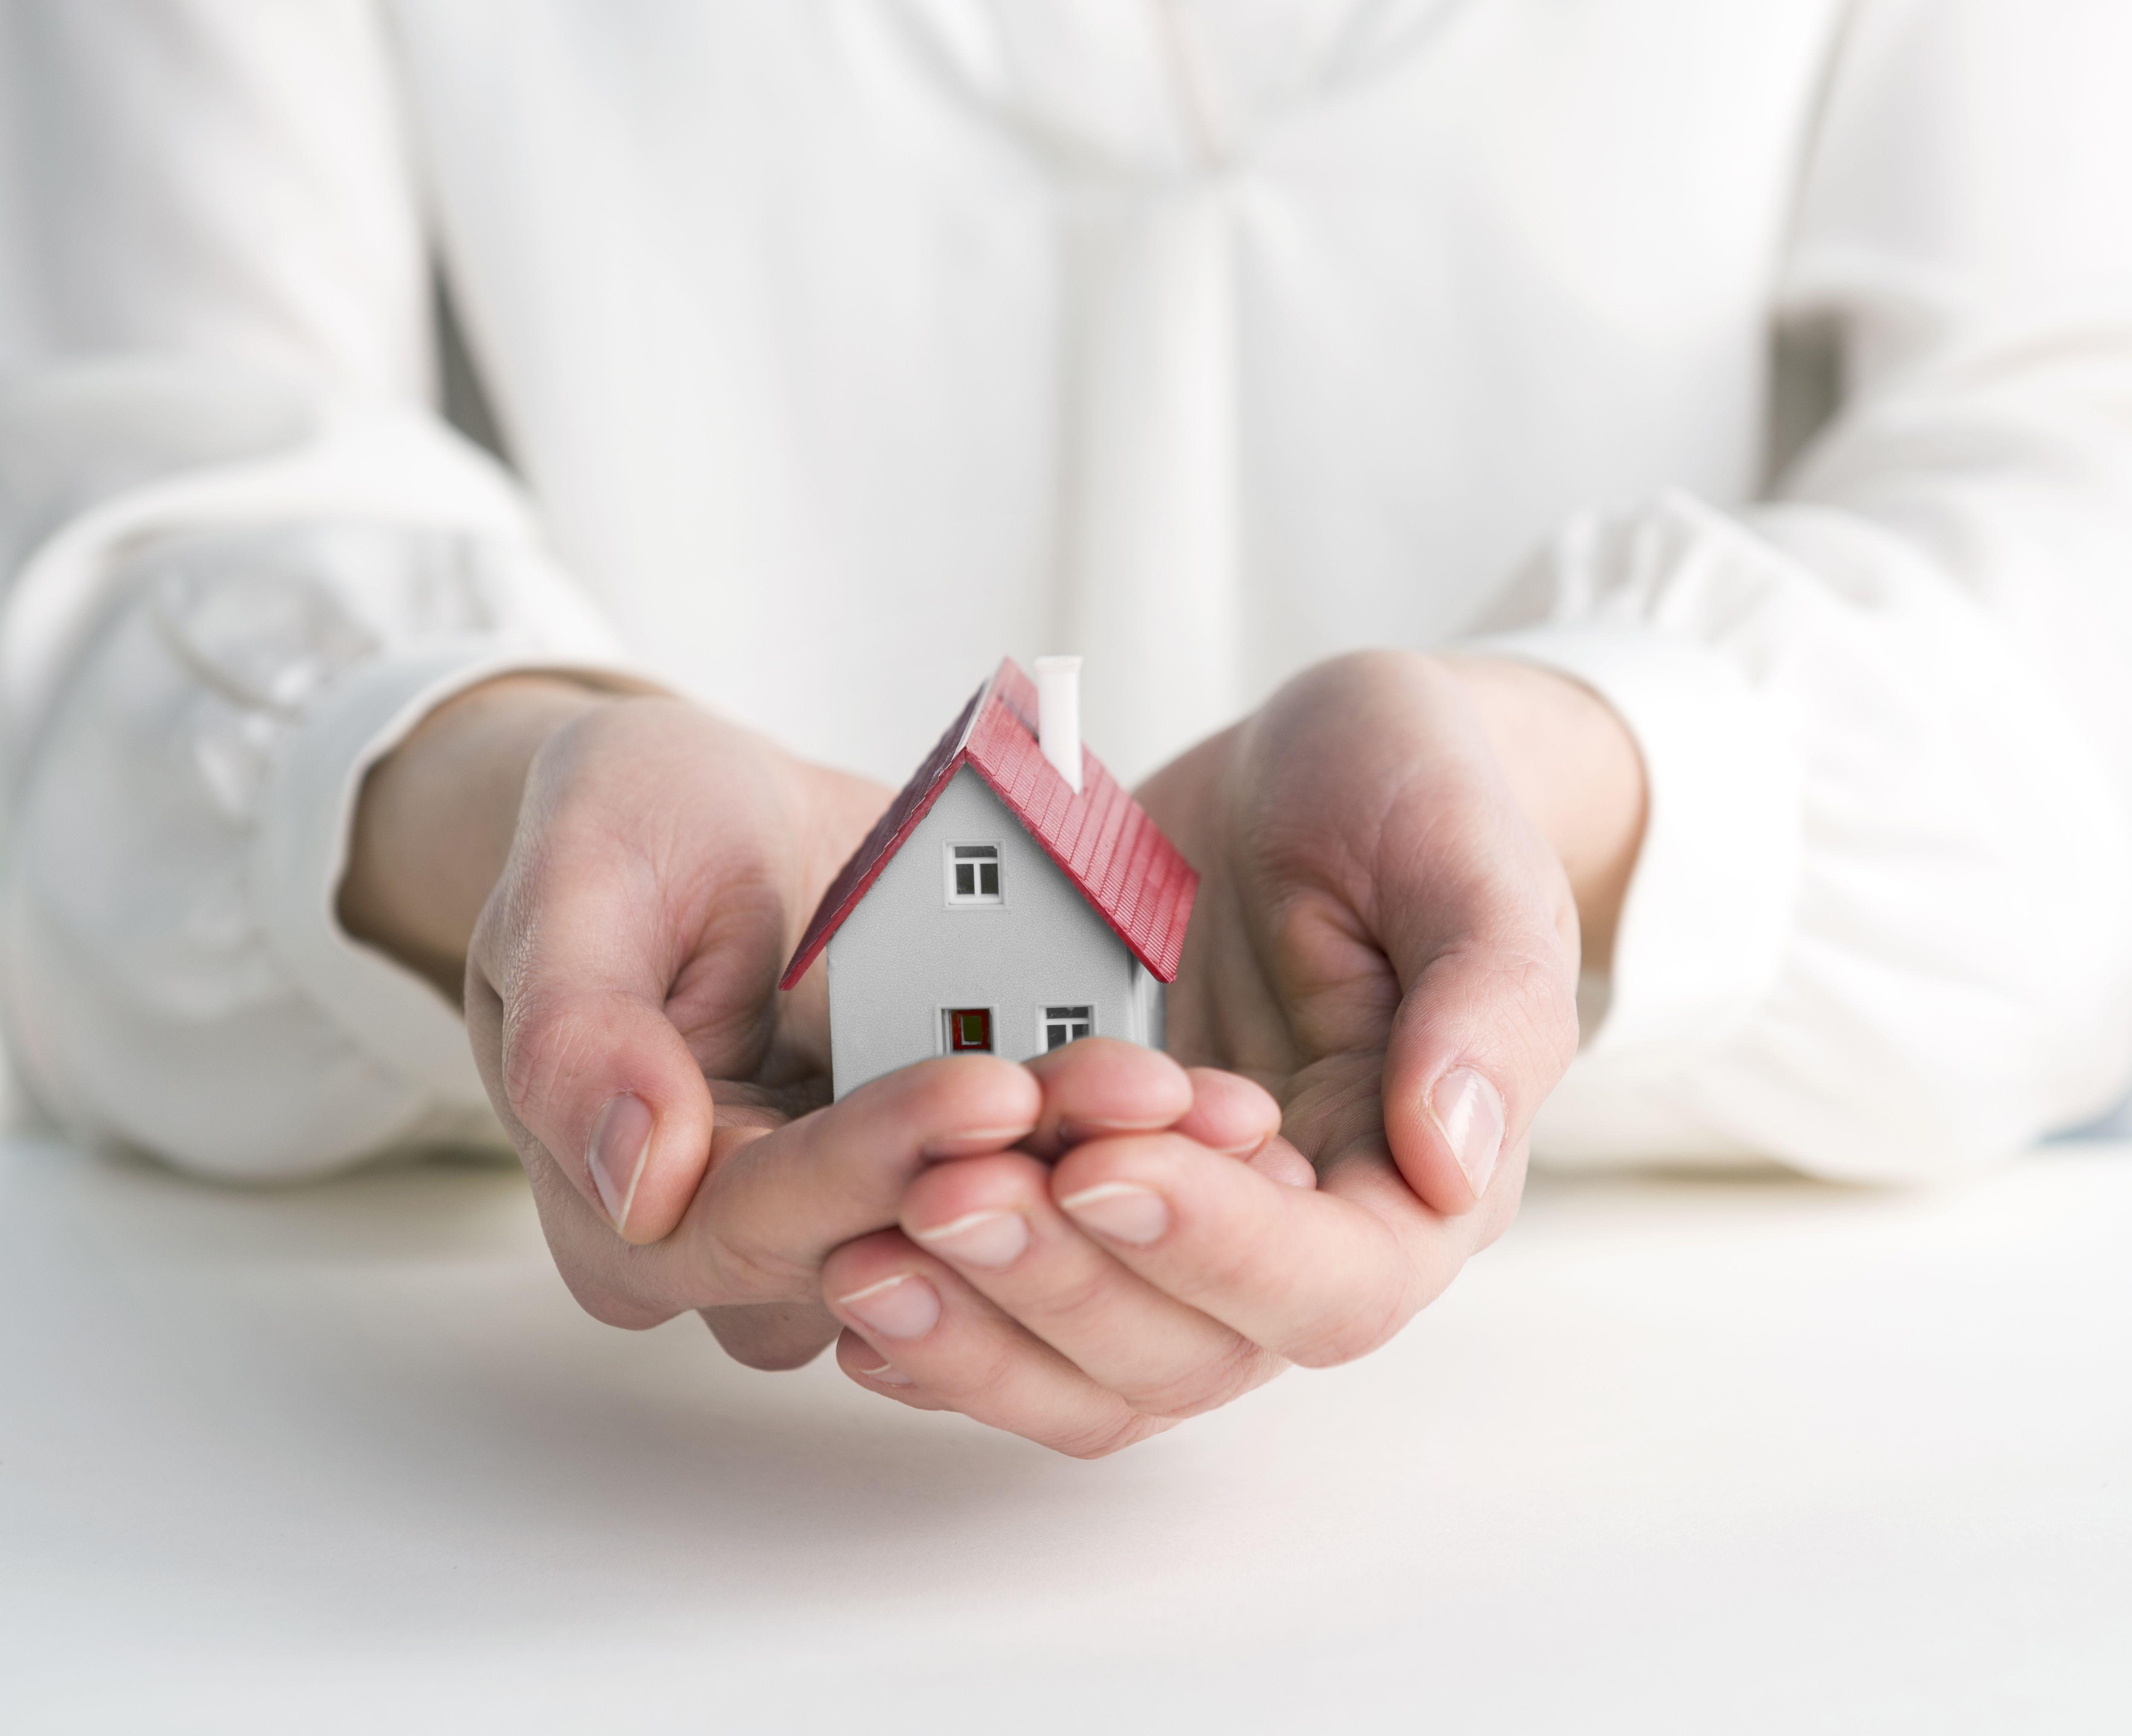 Seguro de hogar: Seguros de Agente de Seguros Ángeles Arranz